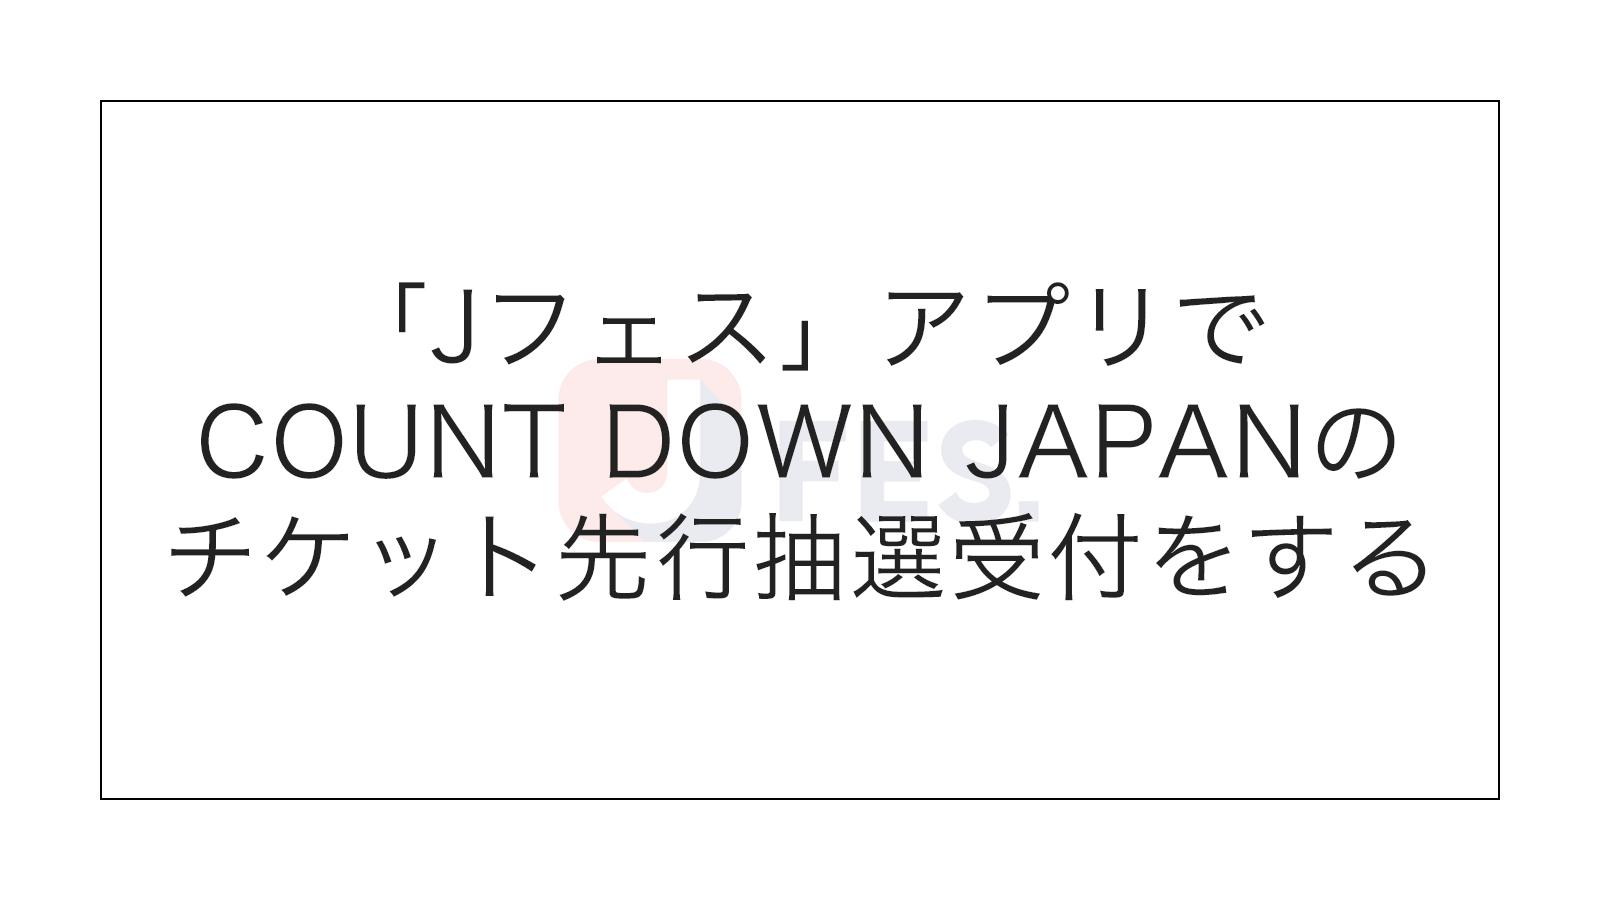 COUNT DOWN JAPAN先行抽選!「Jフェス」アプリでチケットを予約・購入する方法